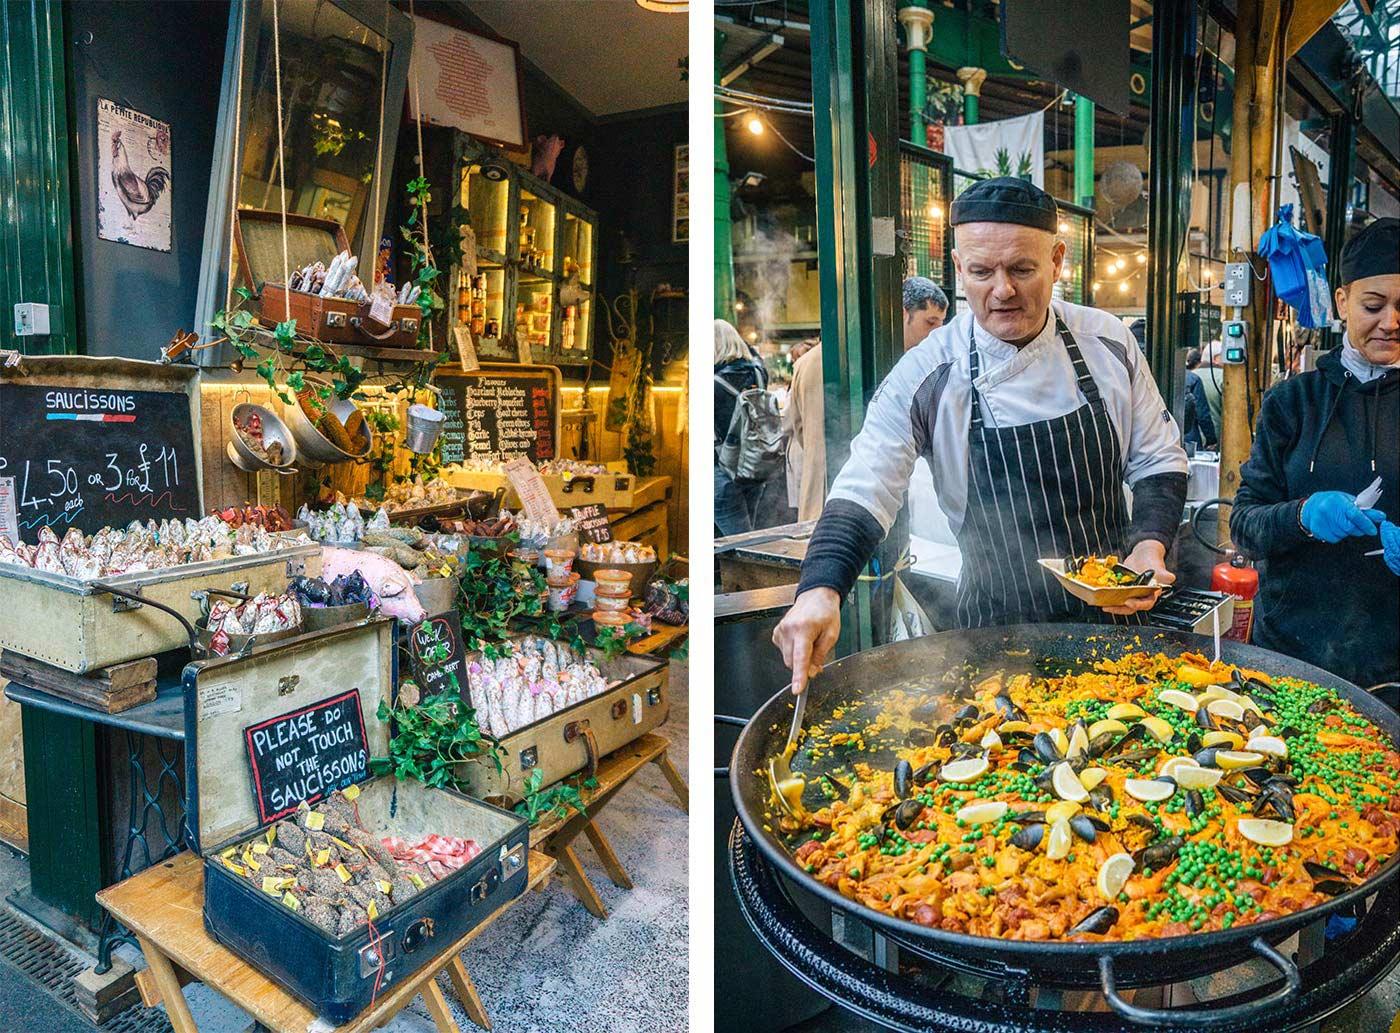 paella stall at Borough market